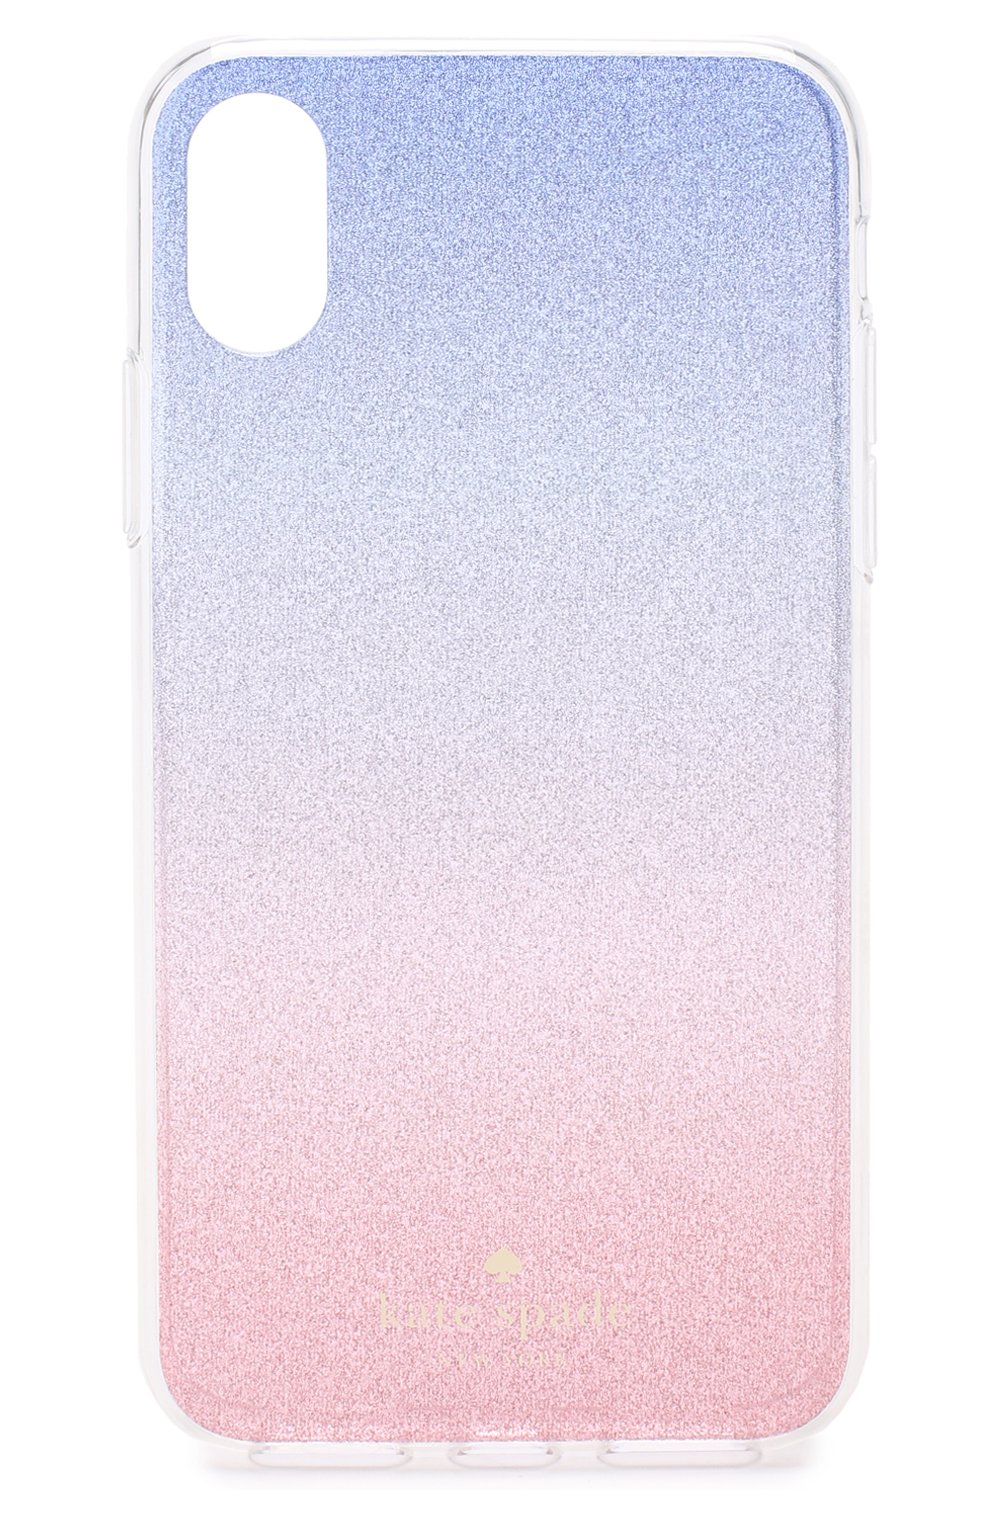 Чехол для iPhone X с глиттером | Фото №1